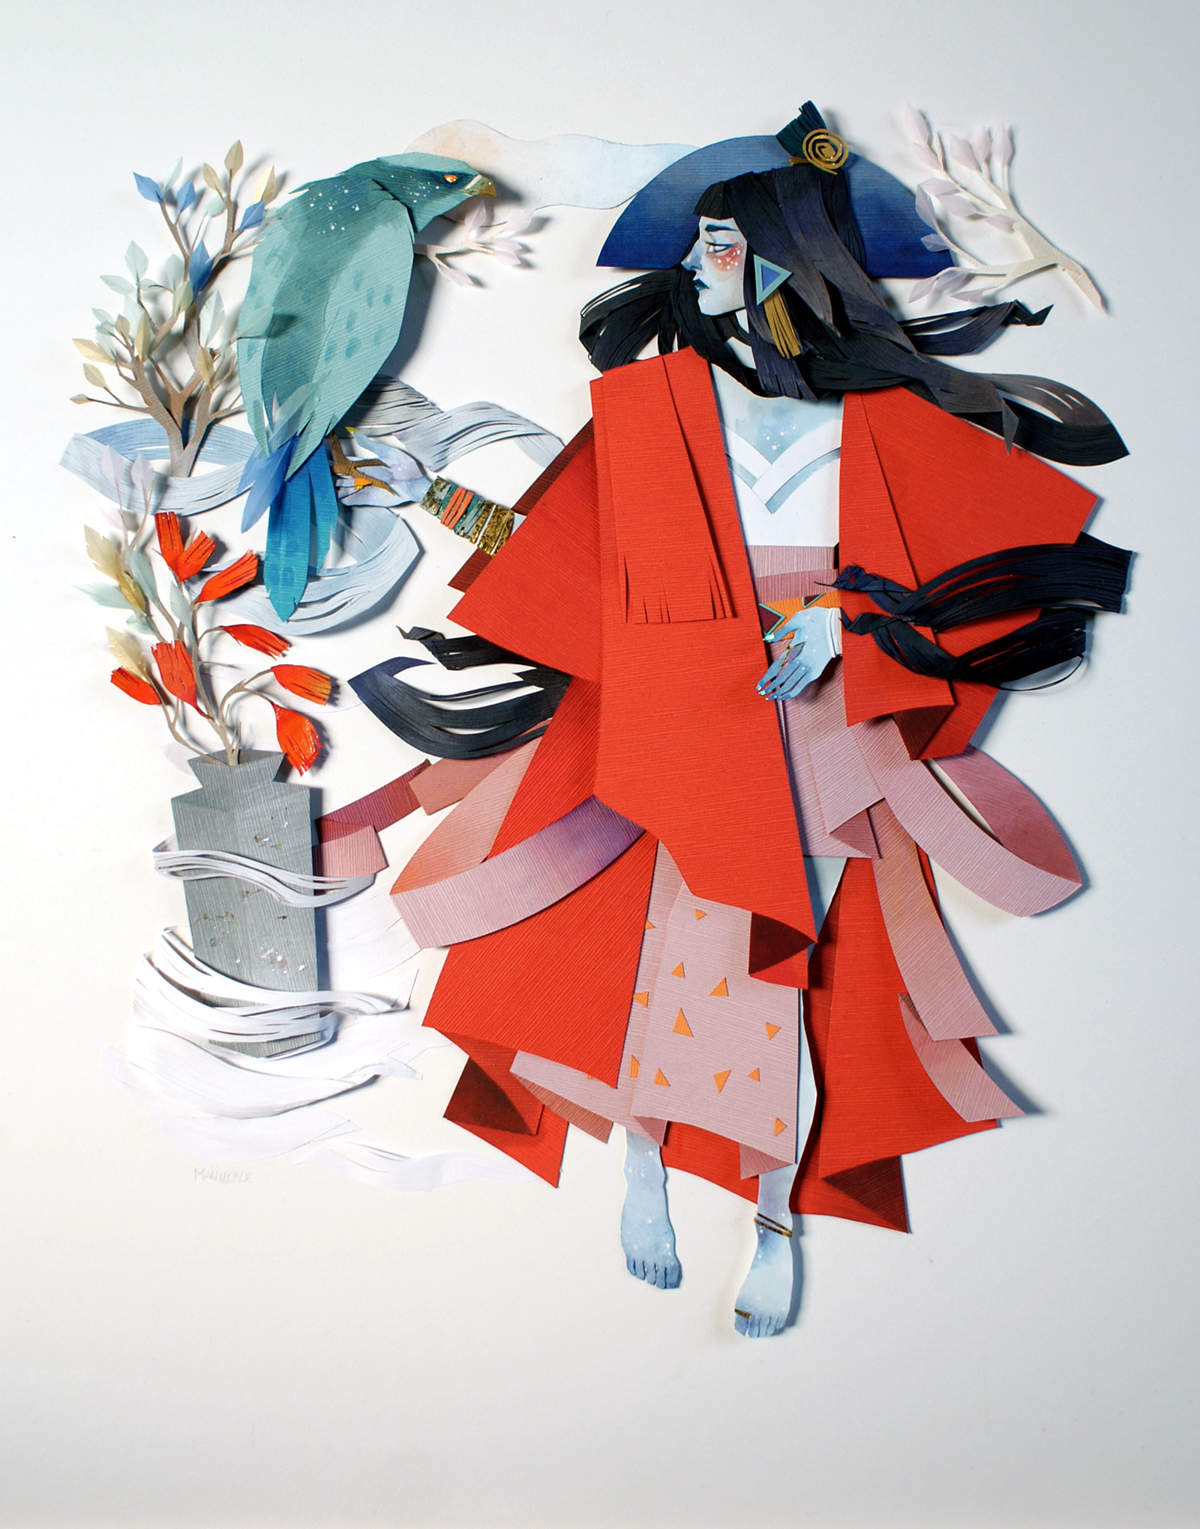 Иллюстрации из бумаги Морганы Уоллес (Morgana Wallace)